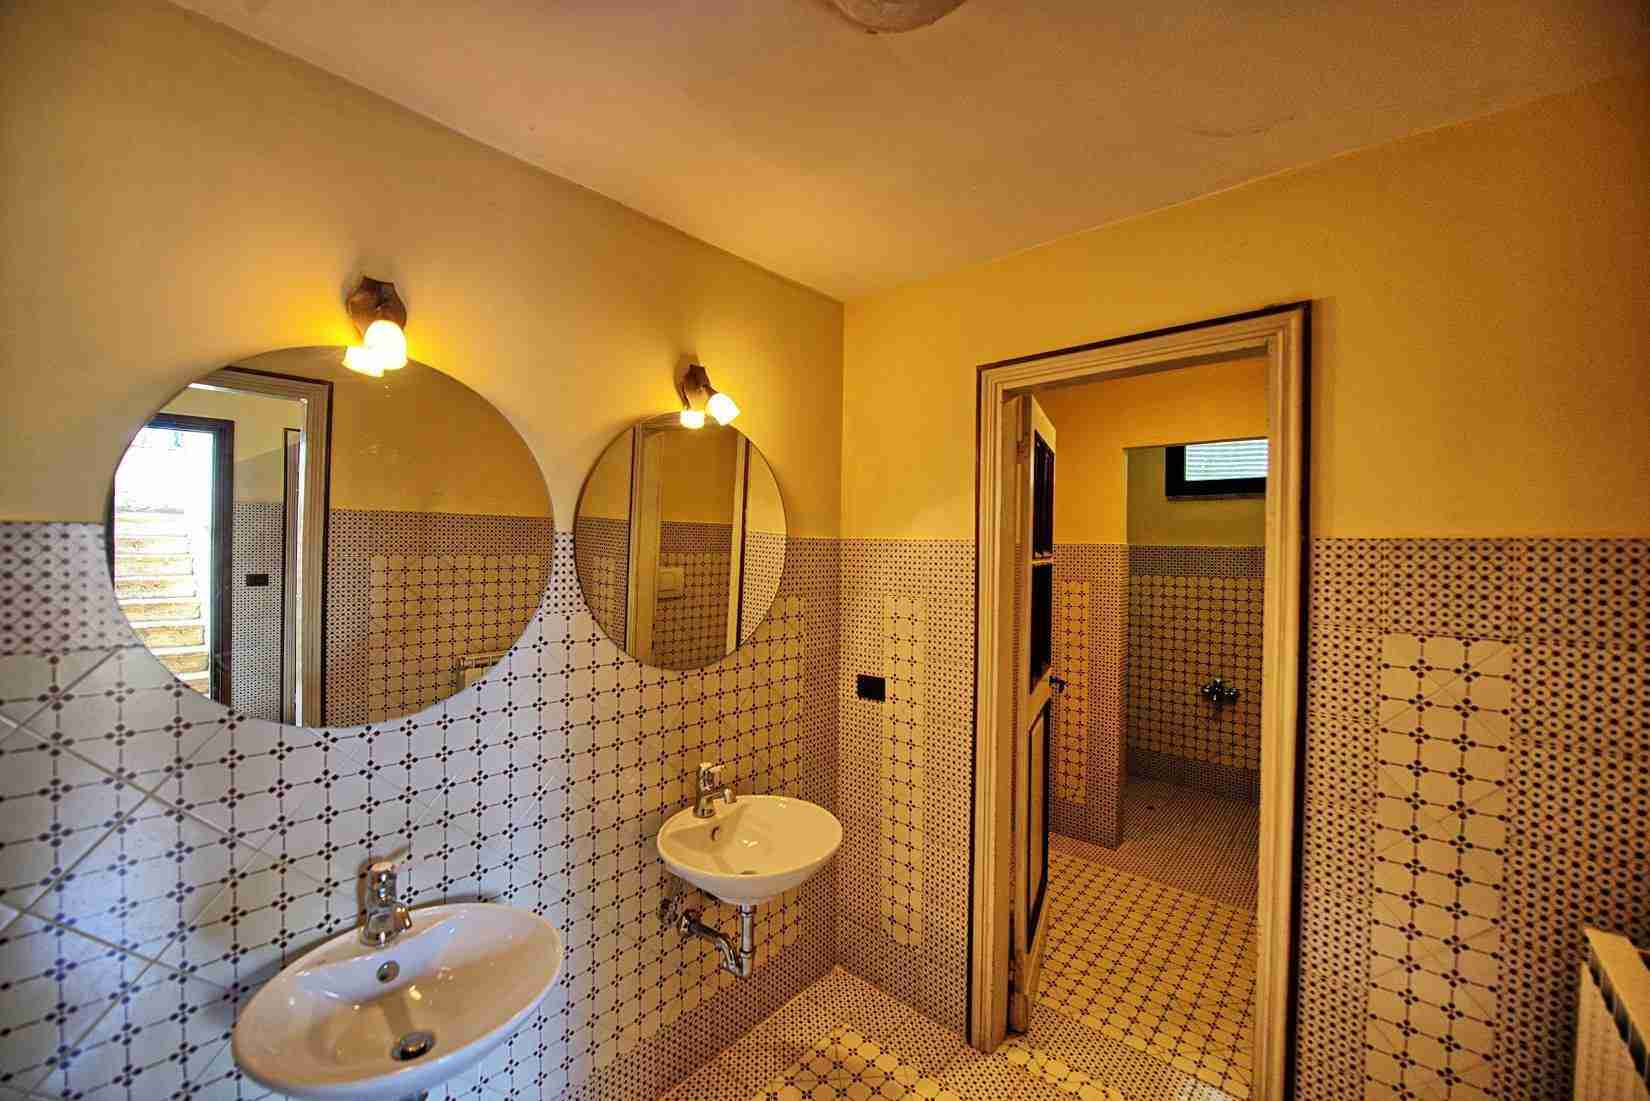 46 Assisi bathroom